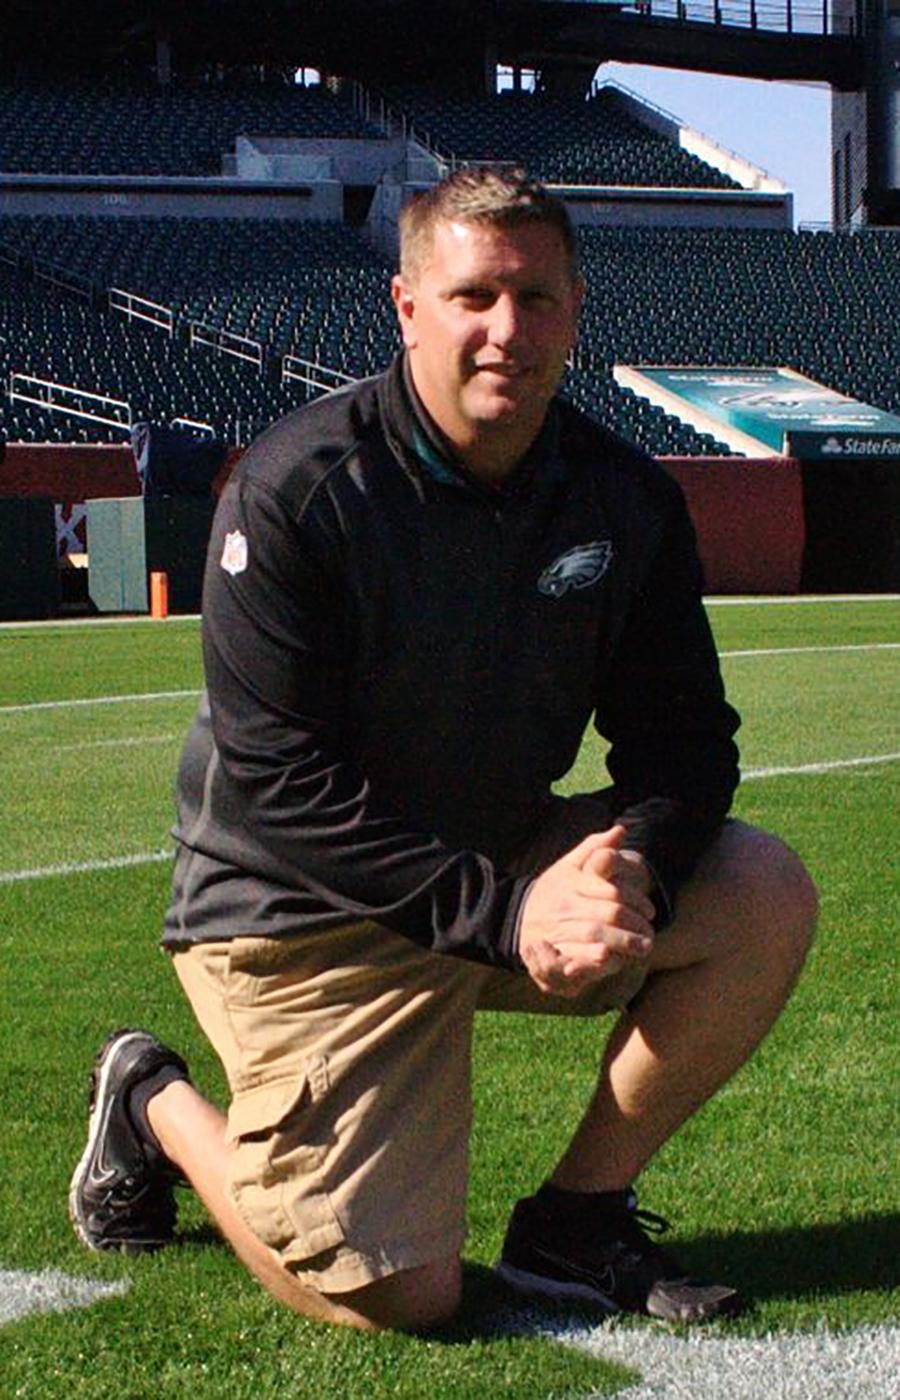 NFL Groundskeeper Tony Leonard